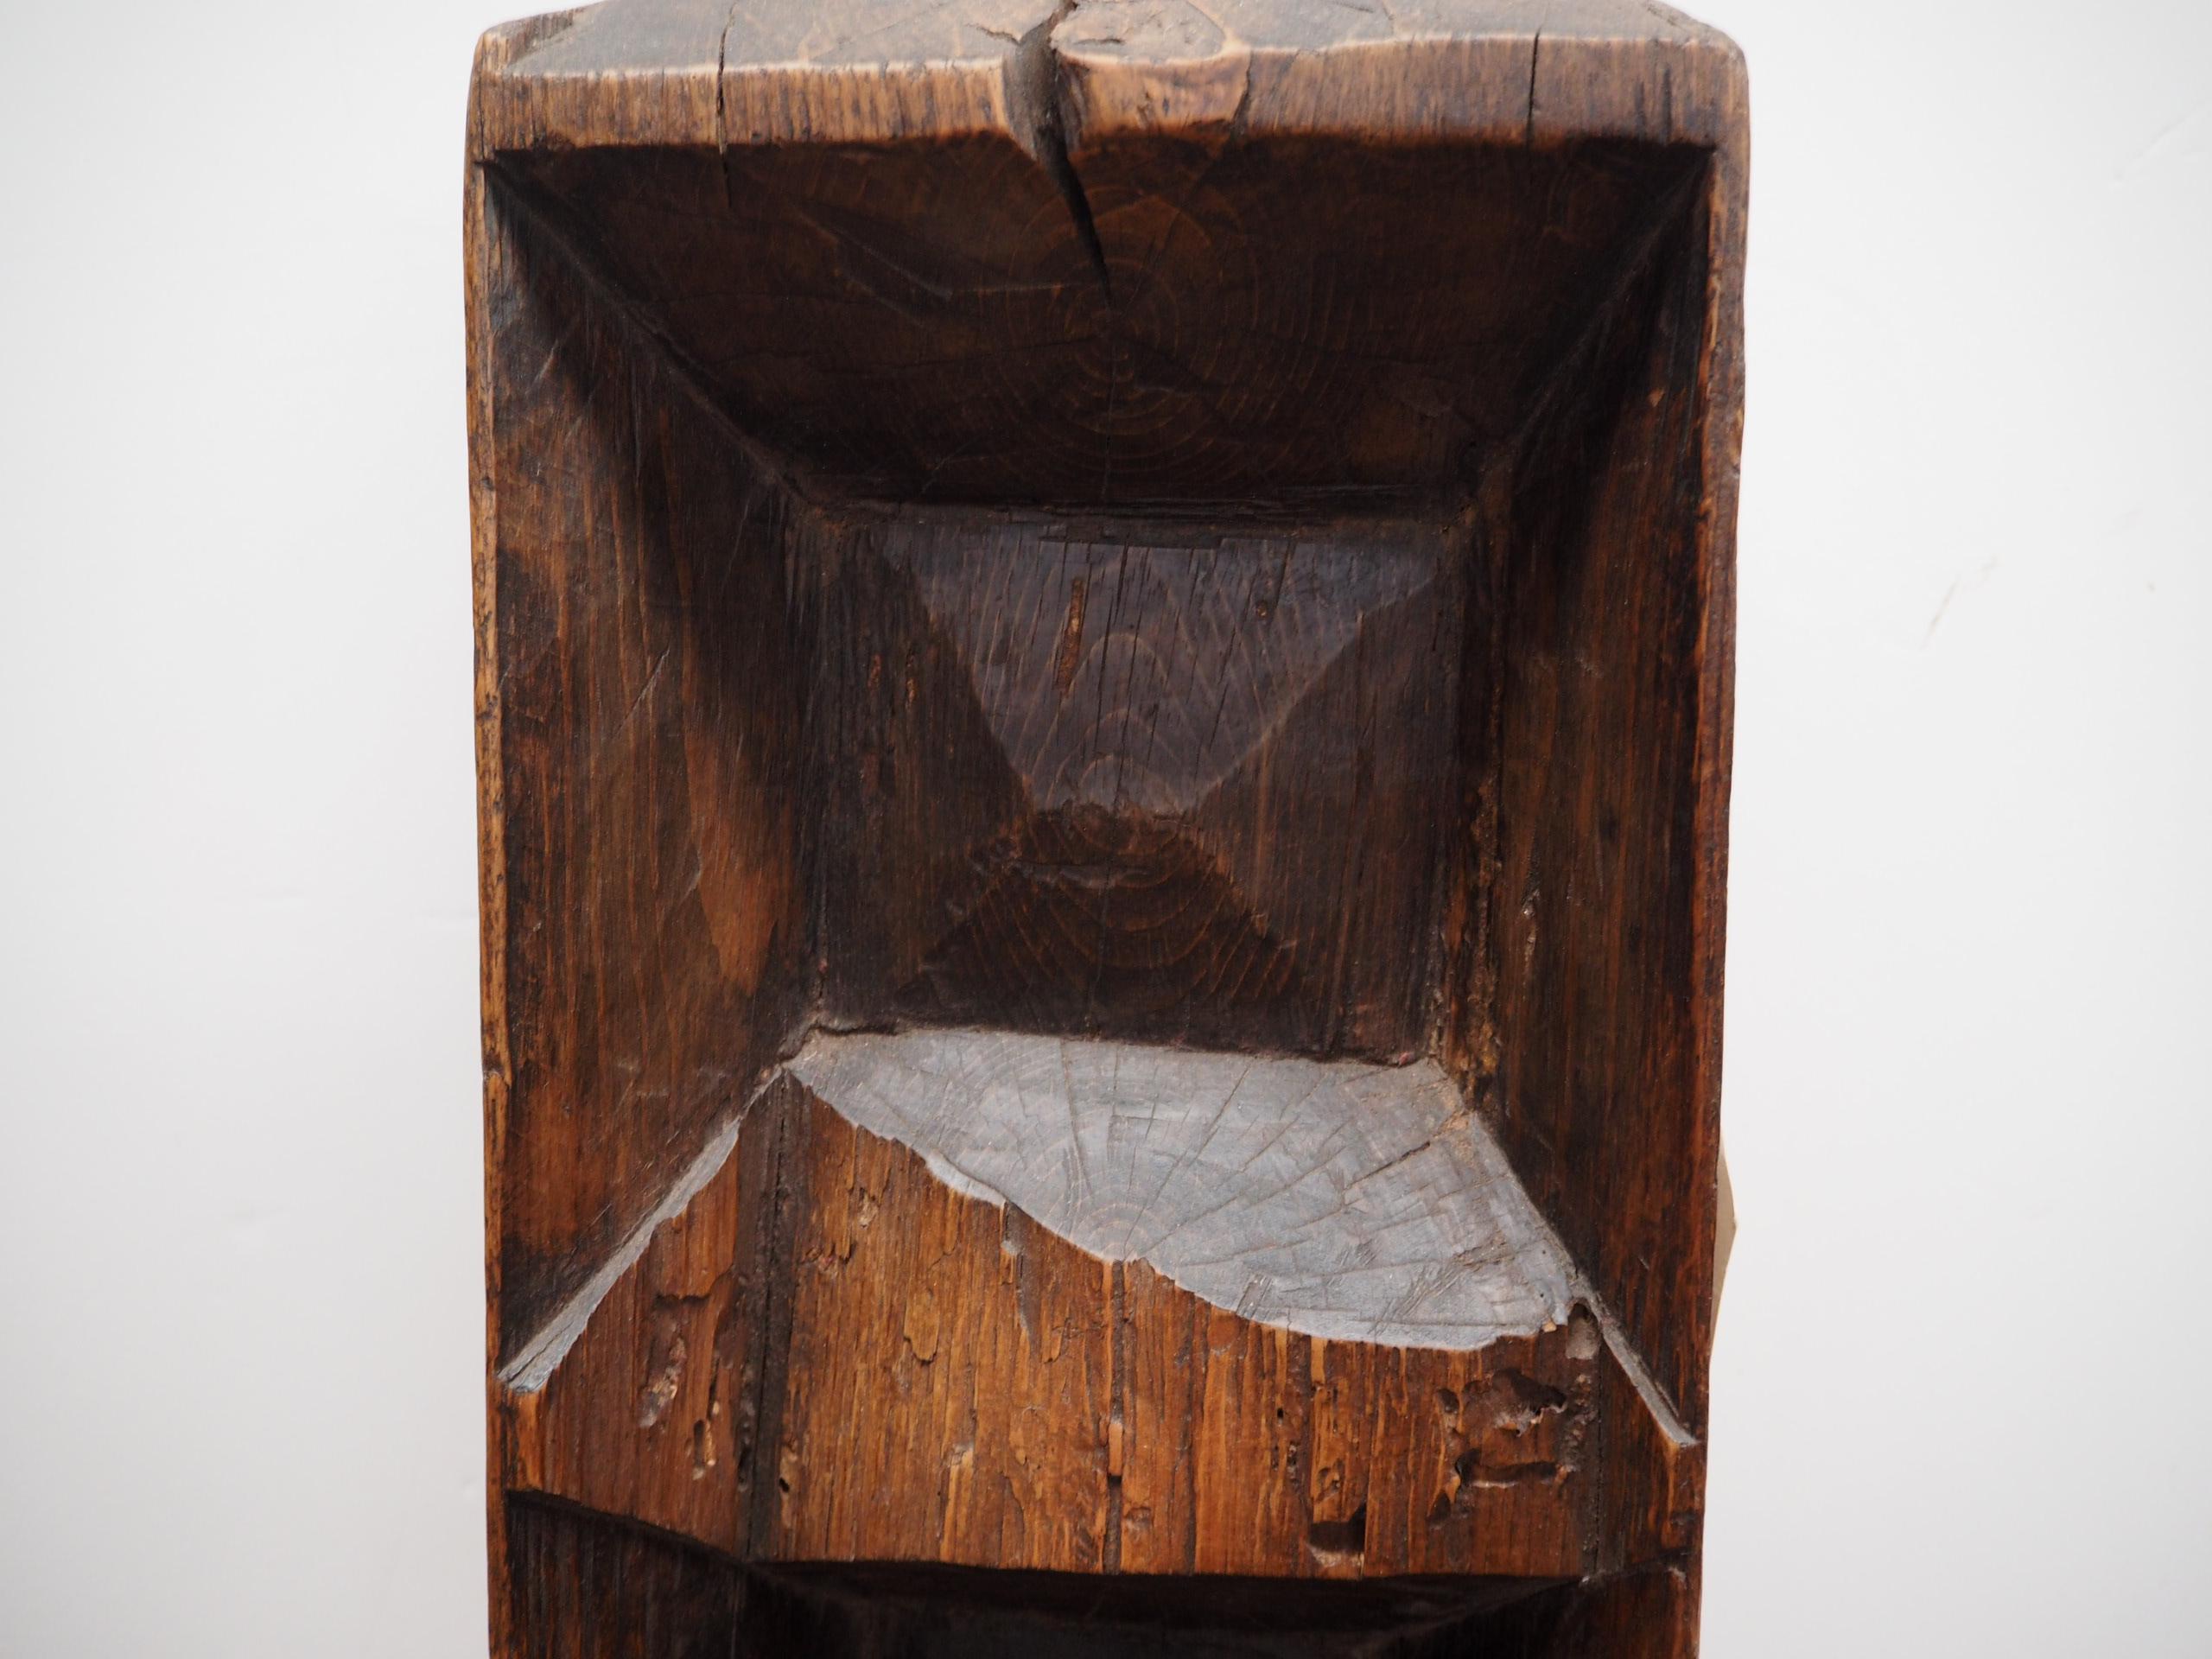 19th Century ottoman period wooden dough riser